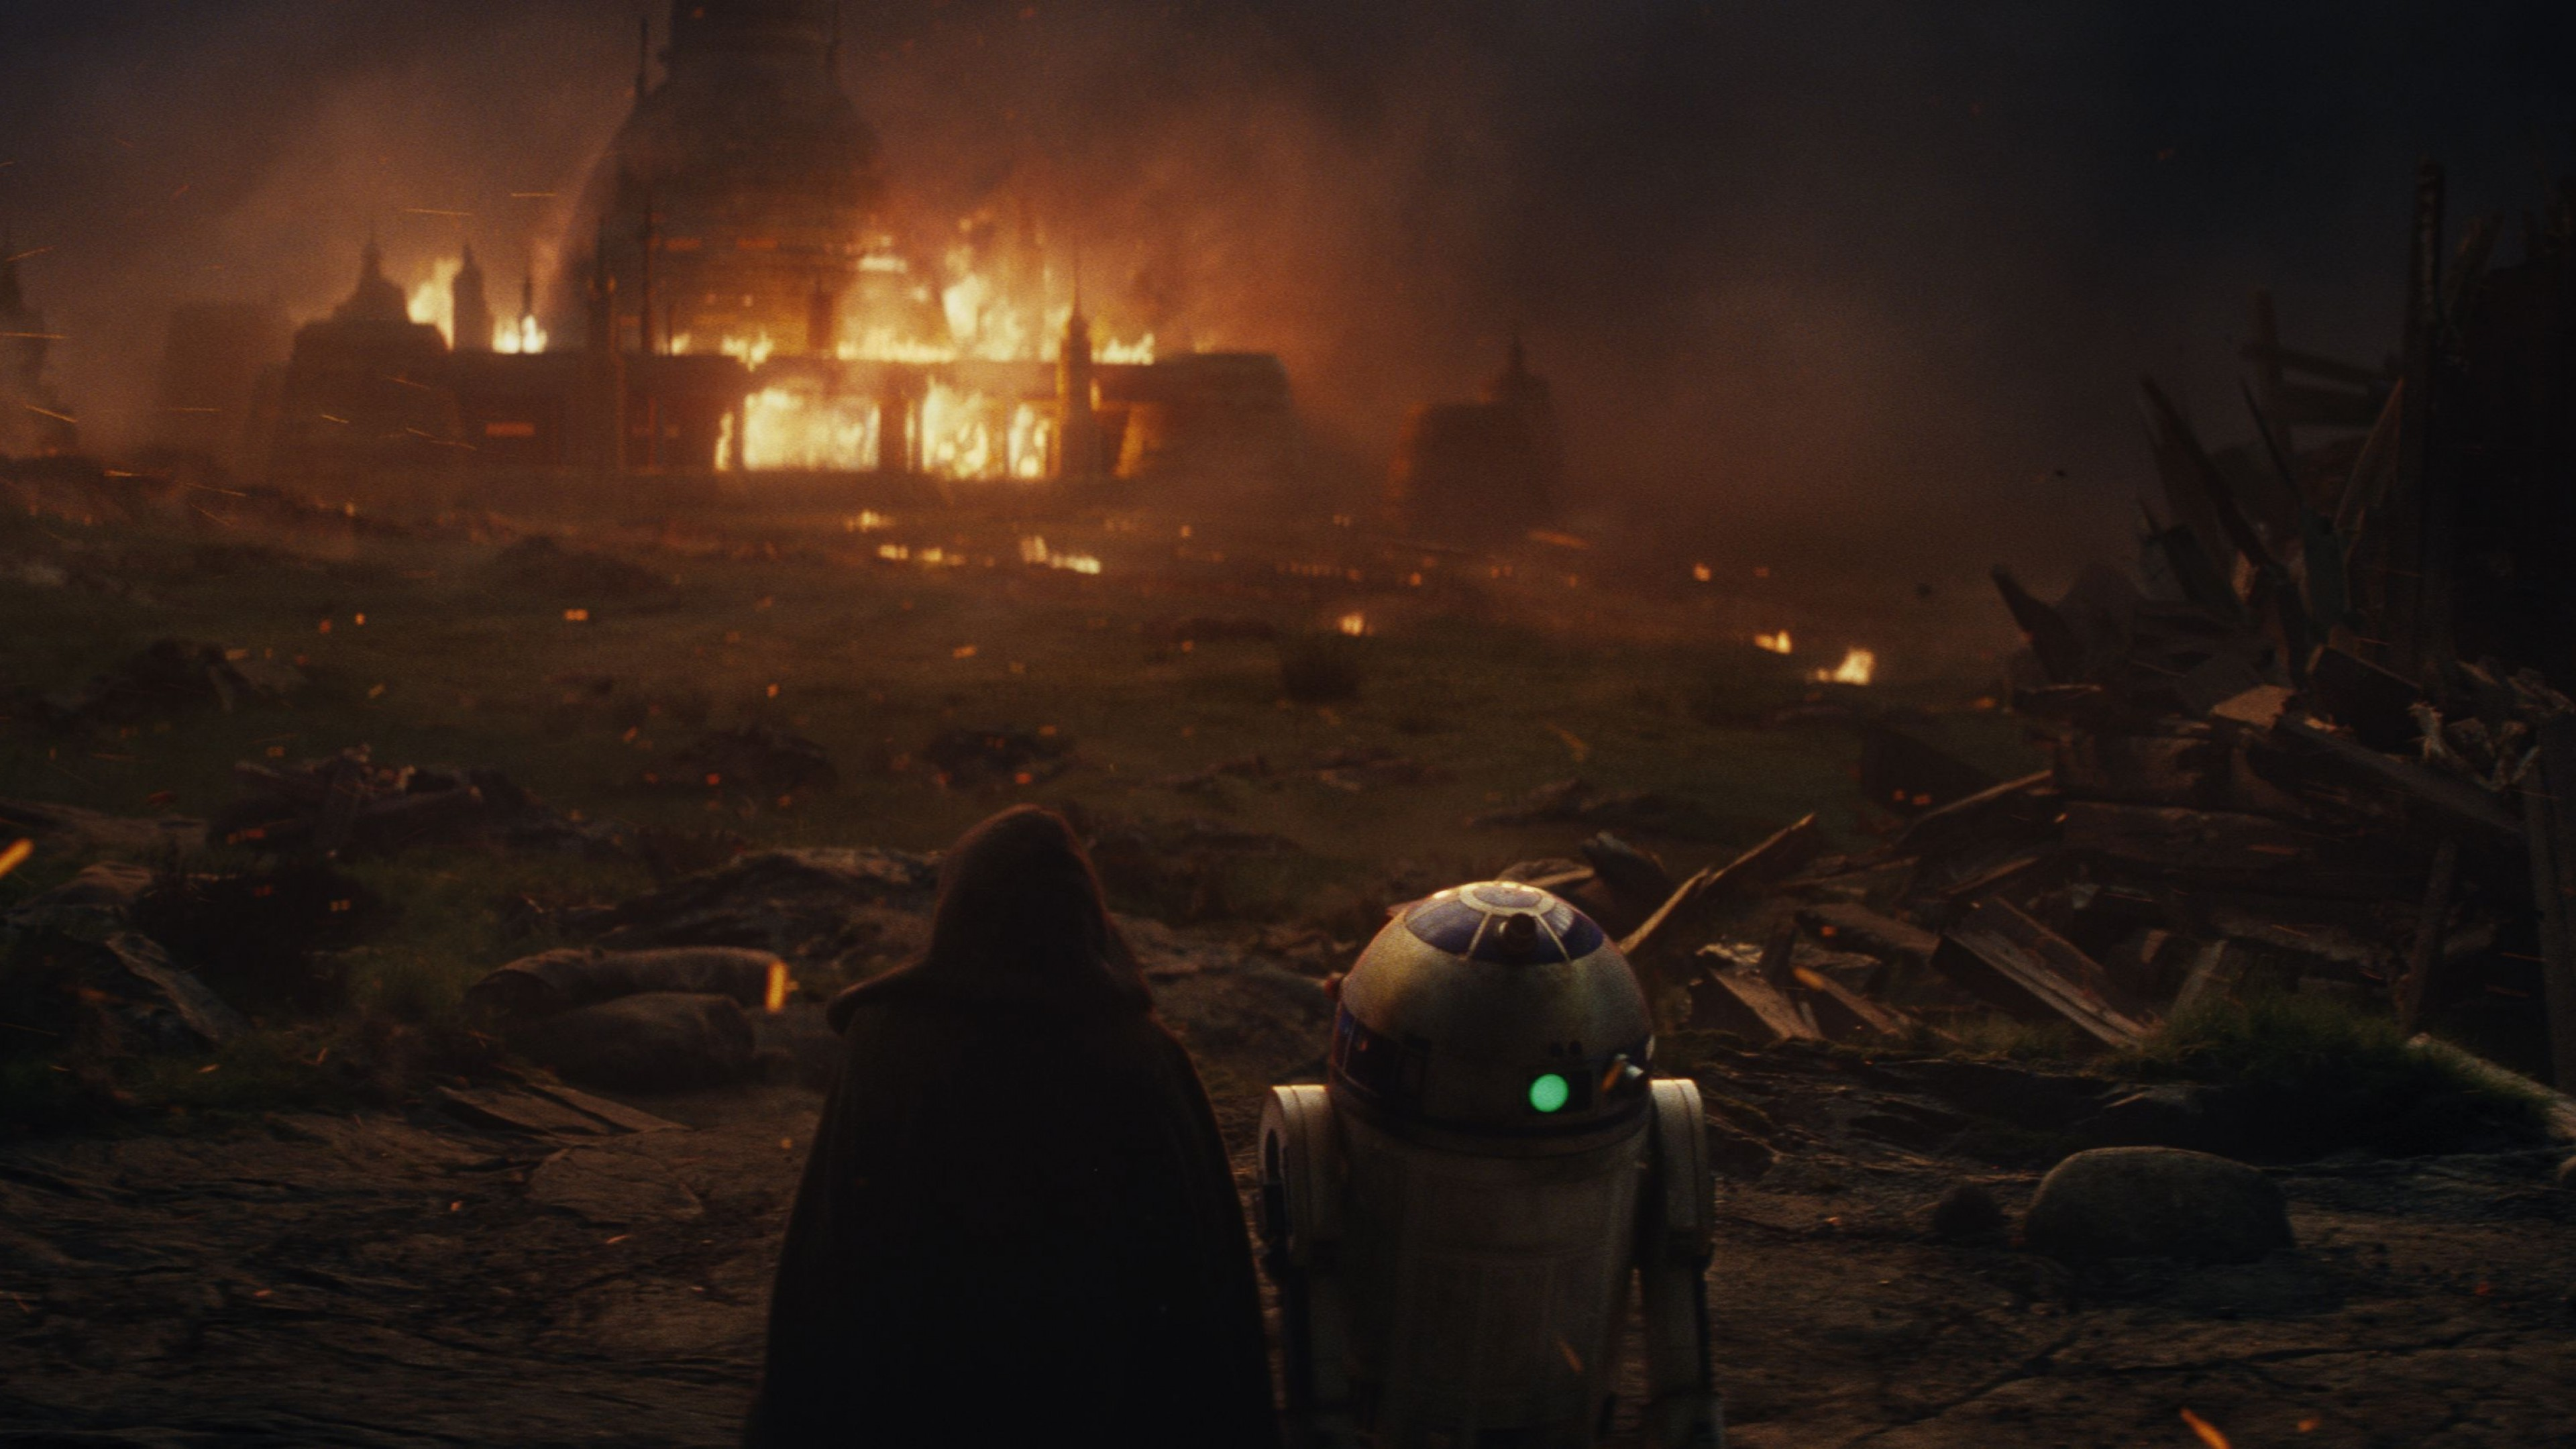 Wallpaper Star Wars The Last Jedi Daisy Ridley Mark Hamill